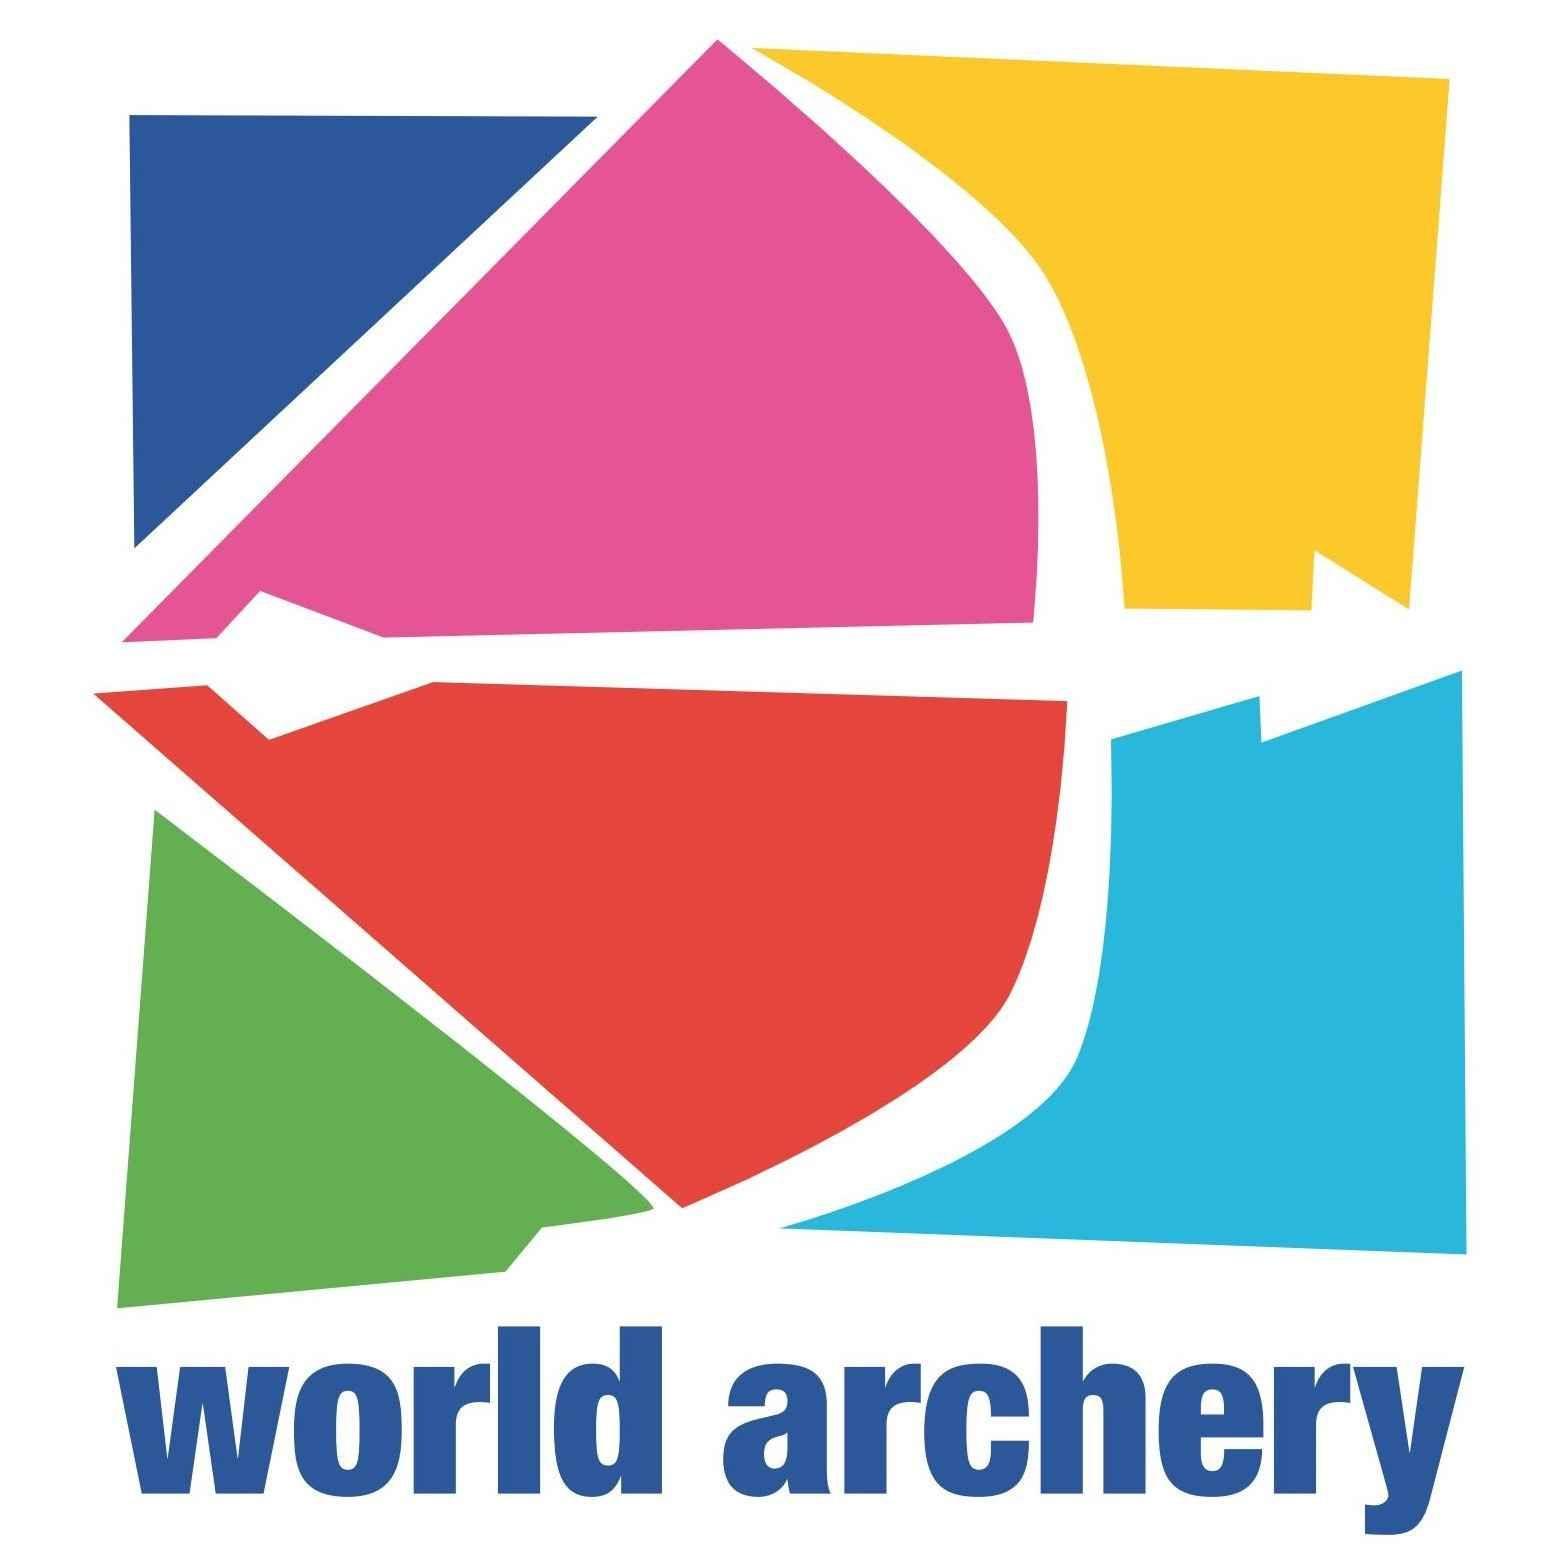 World Archery Federation Logo Wa Vector Download World Archery Federation Logo Wa 2019 World Archery Federation Logo Wa Png Hd World Archery Federation